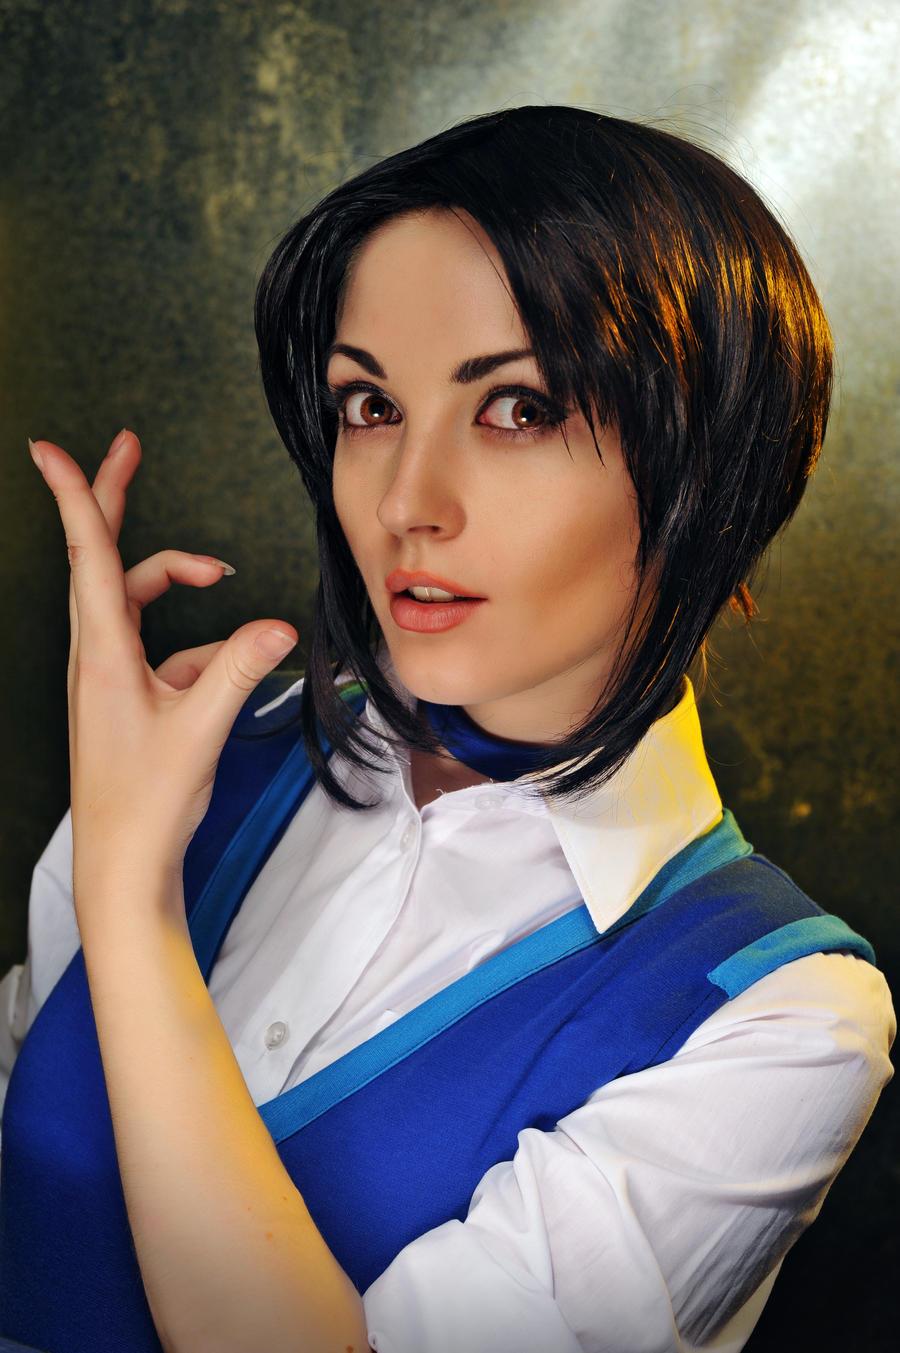 - jackie_chan_adventures_cosplay_by_milenahime-d5uvijs